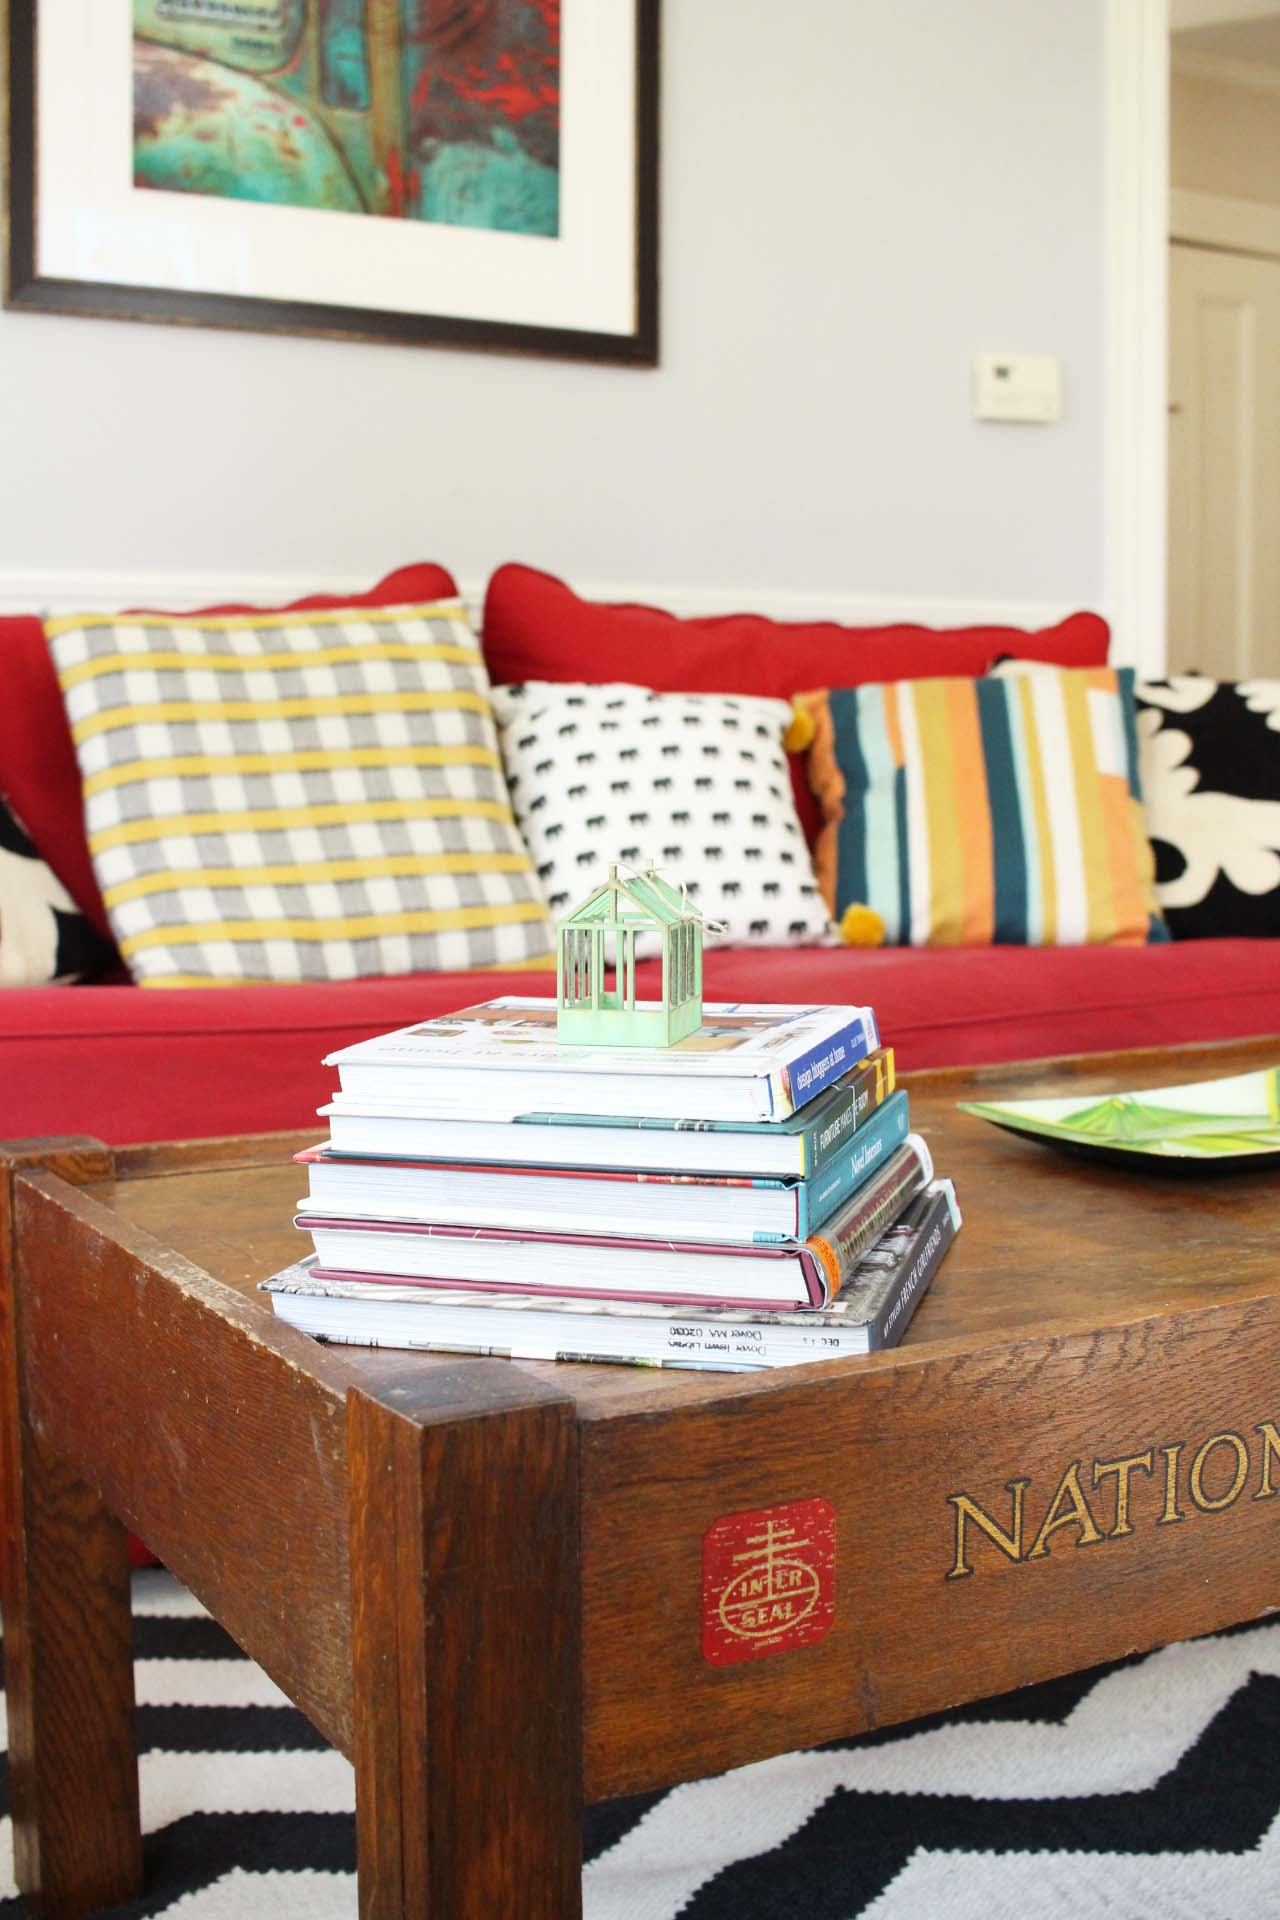 Zandra's National Biscuit Company Table